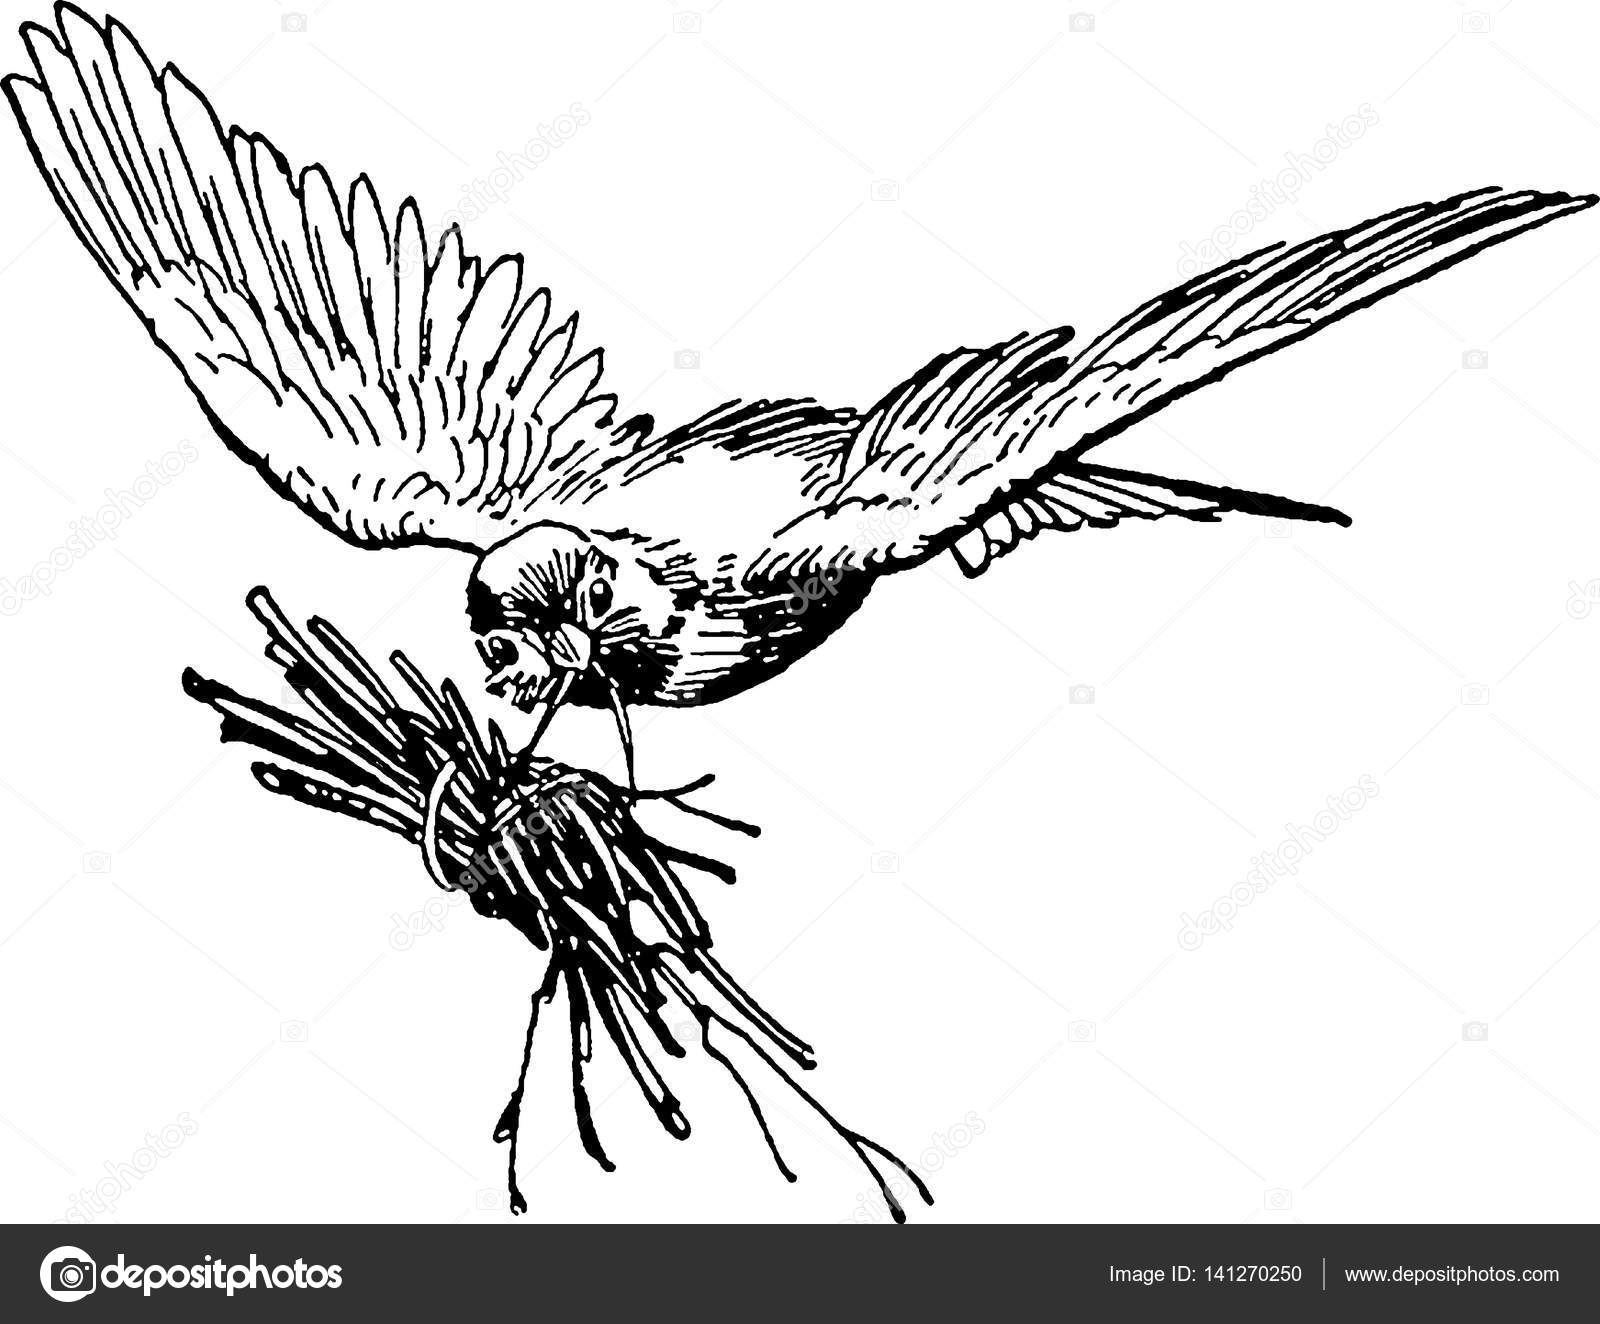 1600x1324 Vintage Image Flying Bird Stock Photo